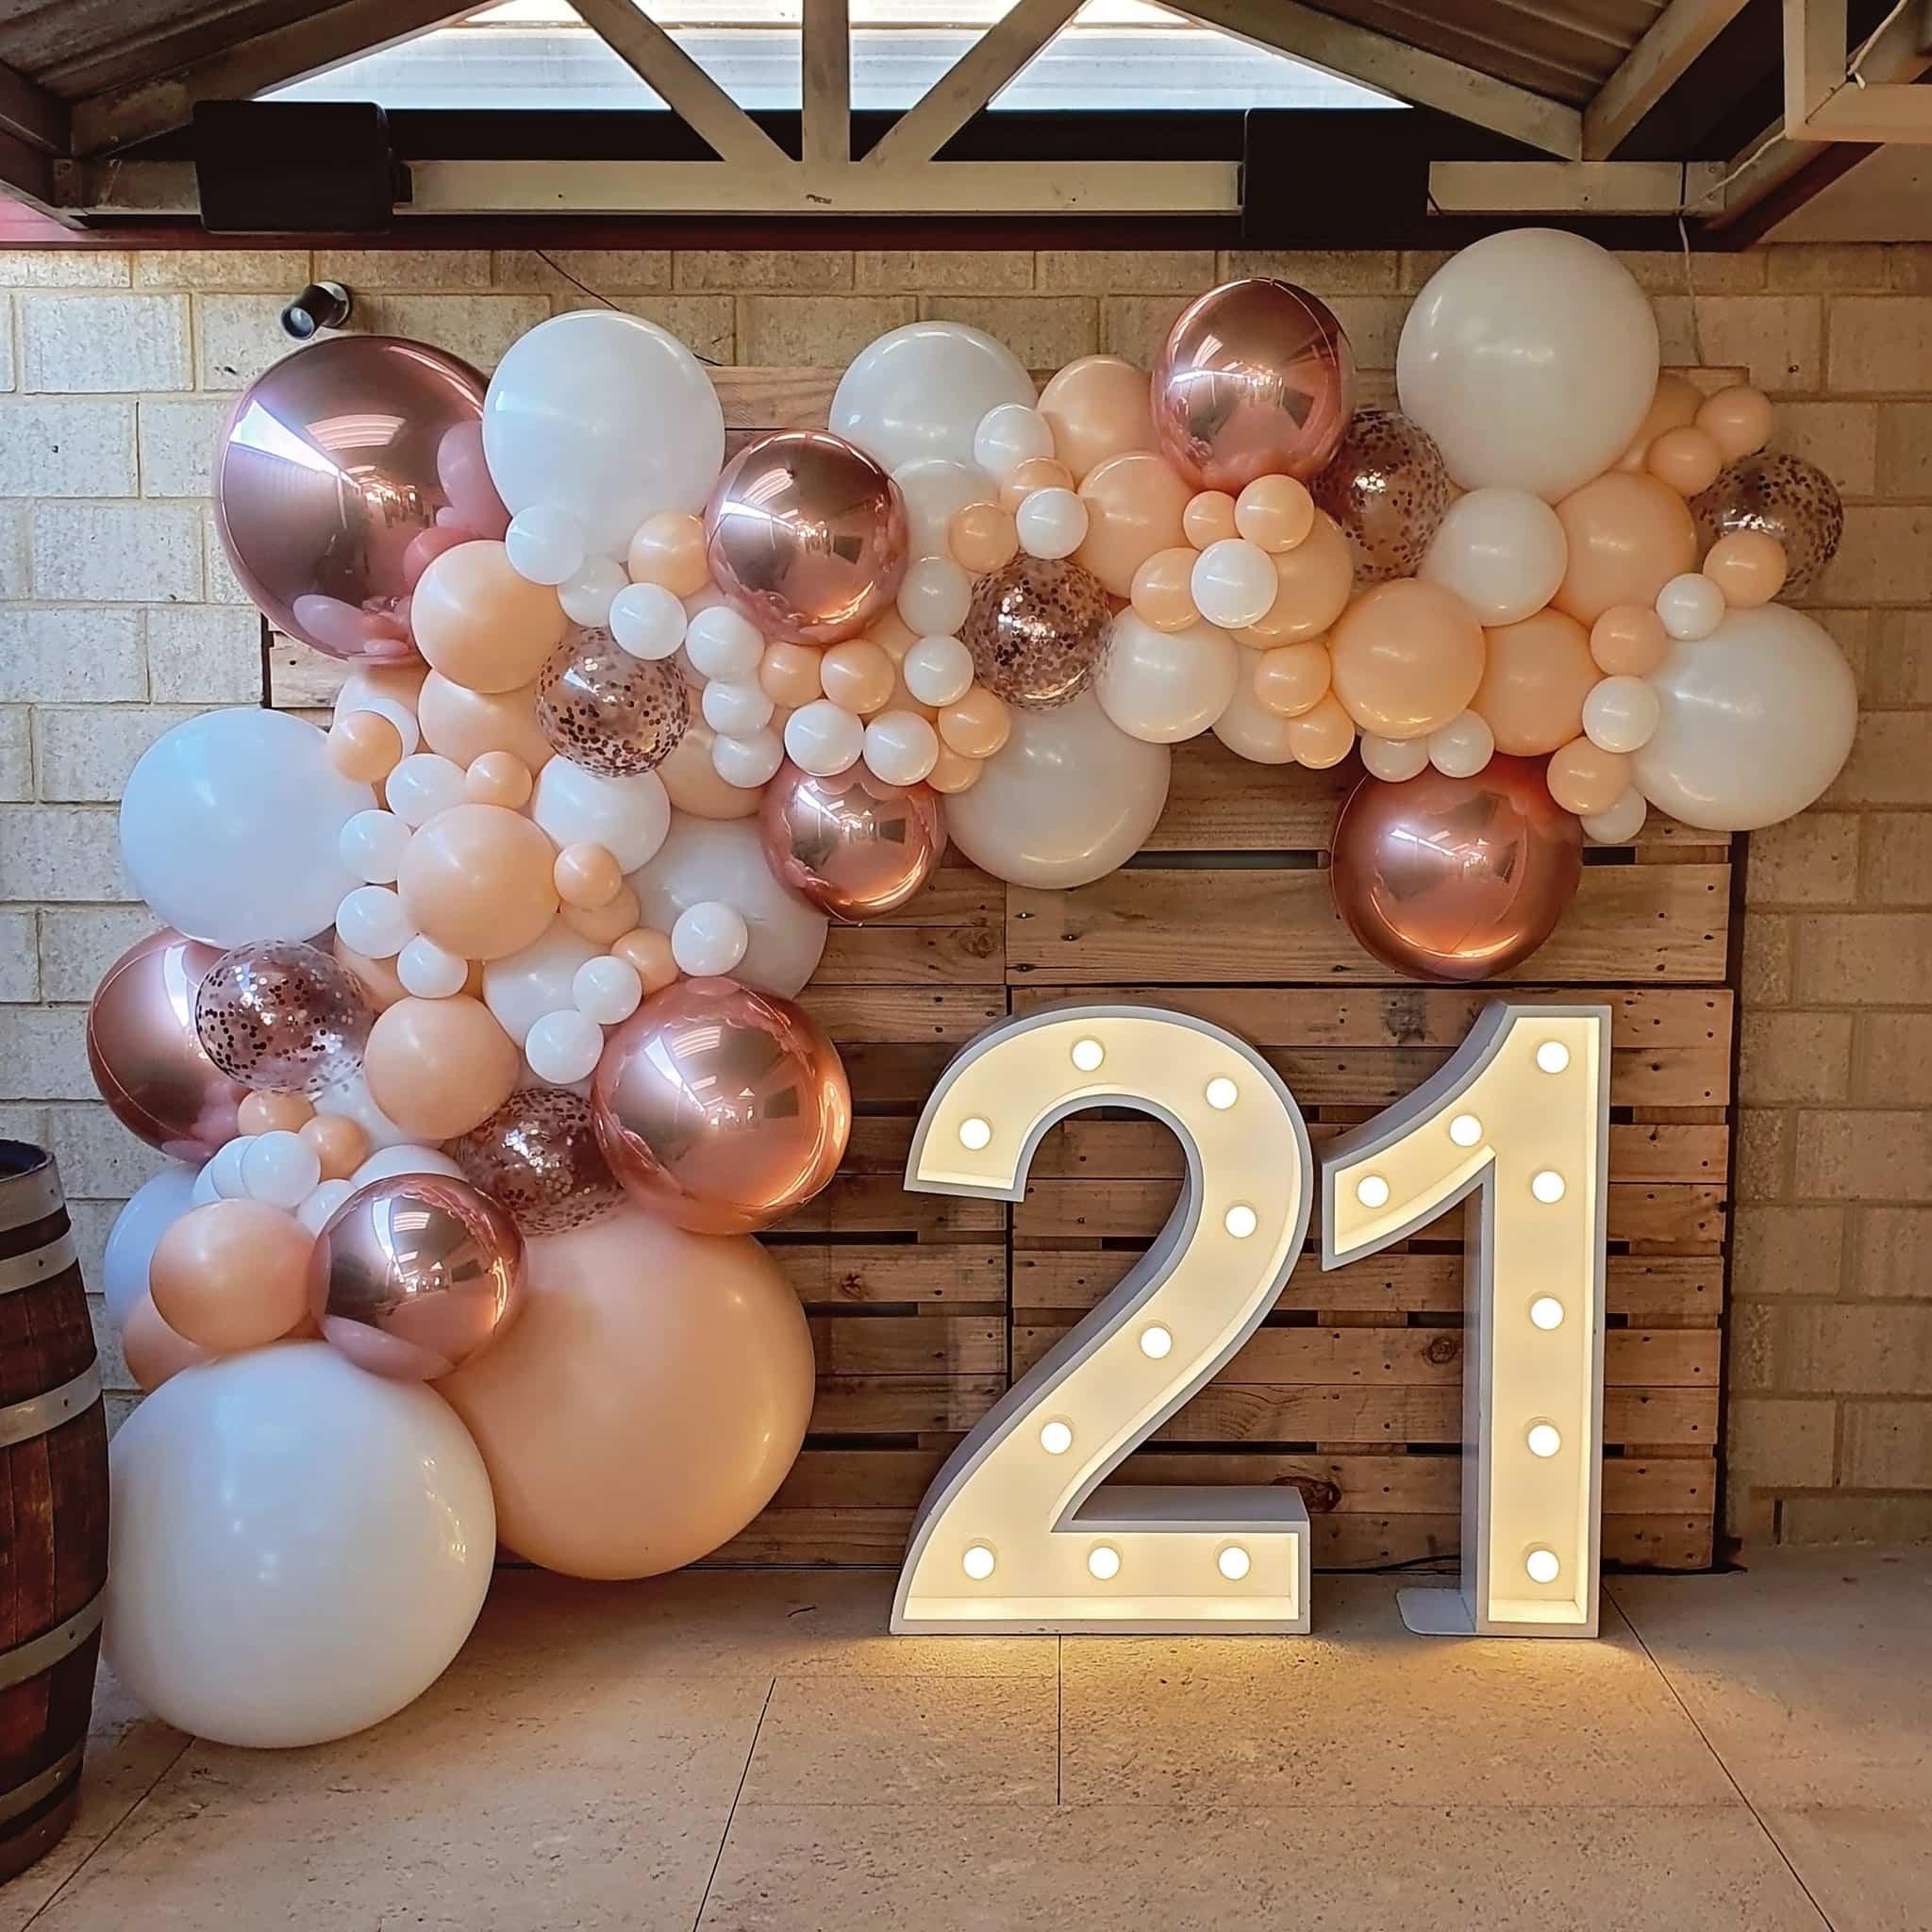 21st Birthday Party Balloon Decor